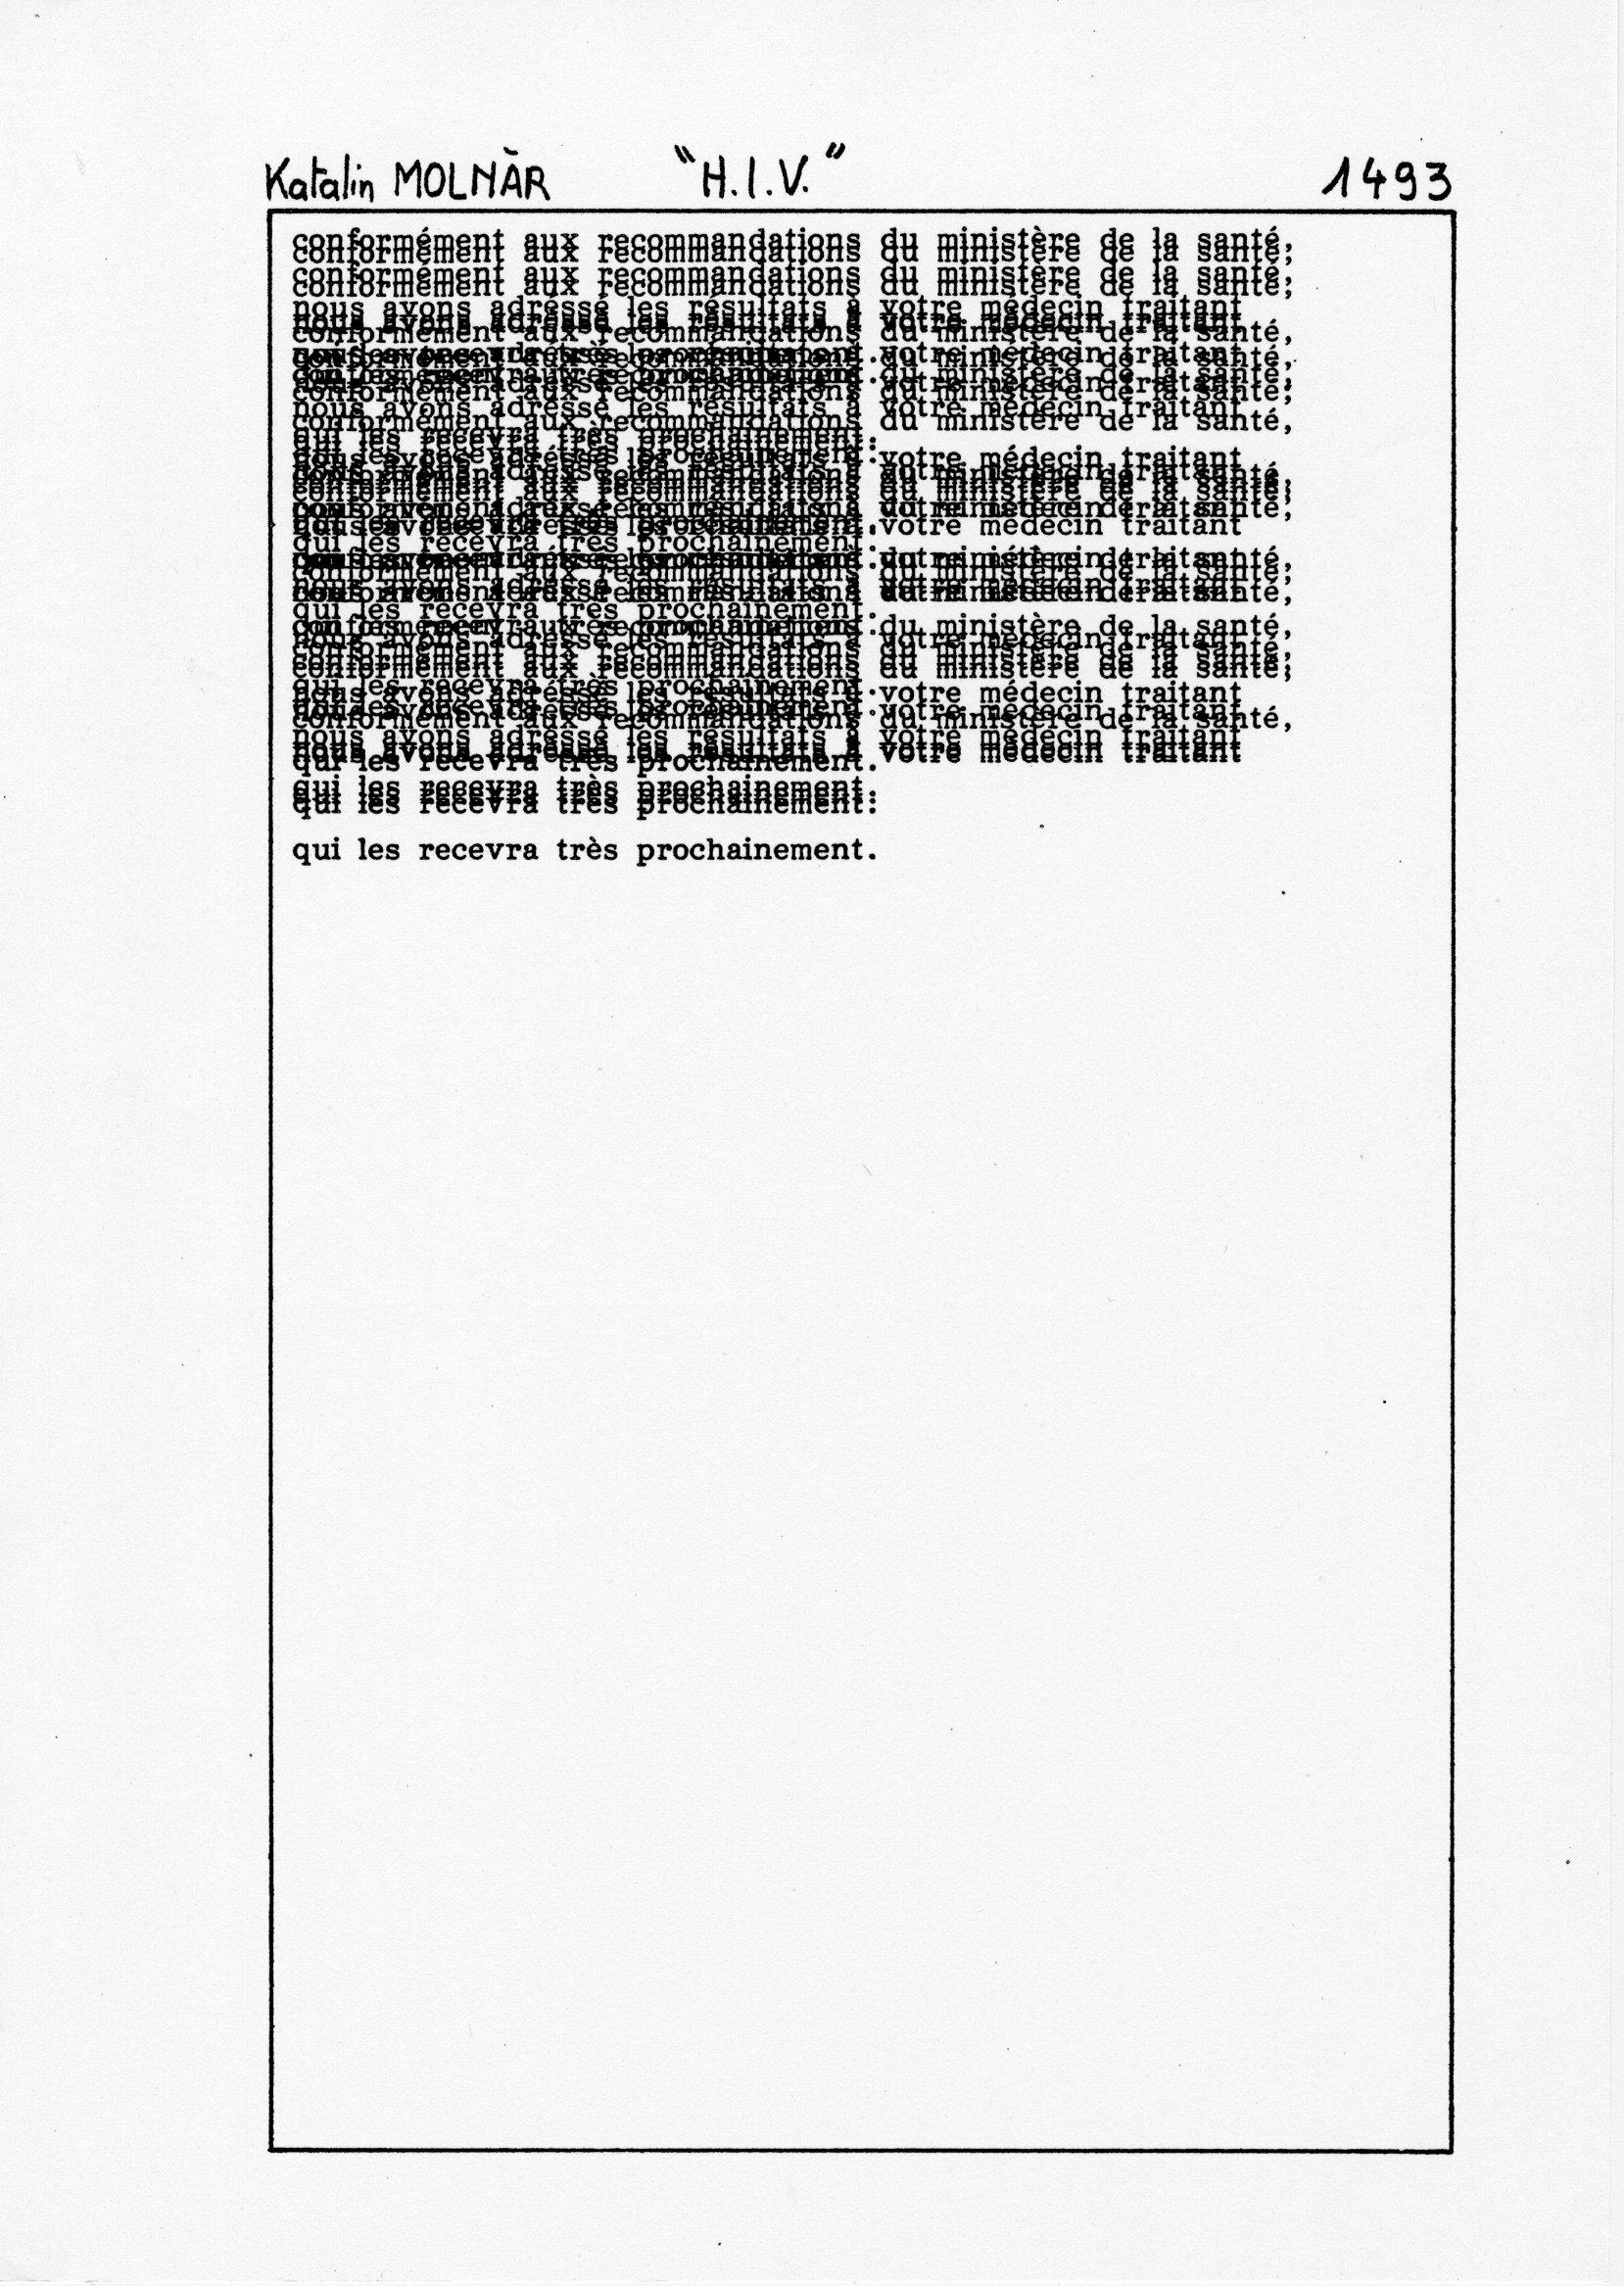 page 1493 K. Molnar H.I.V.